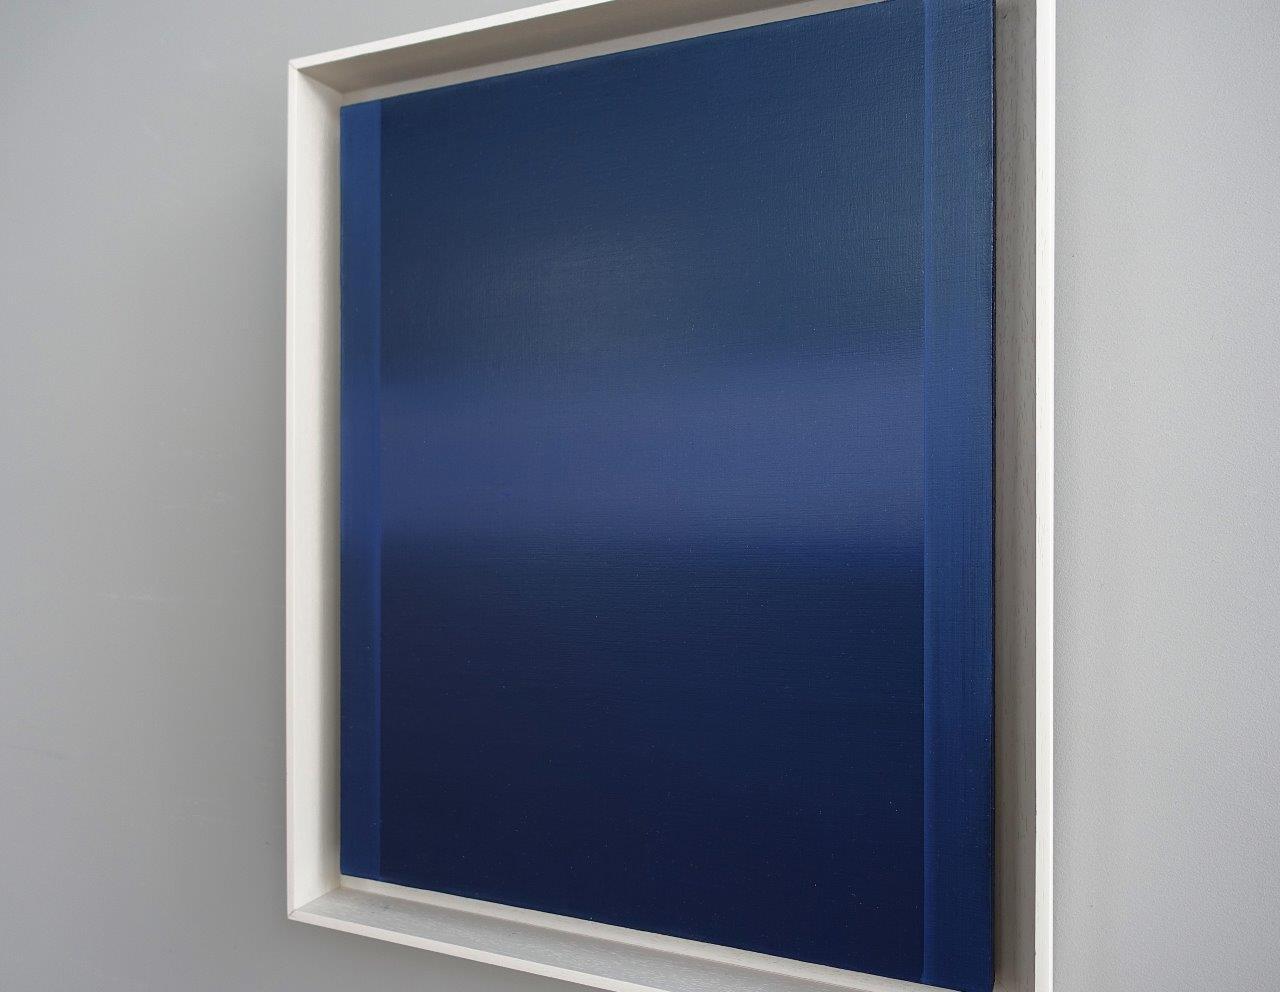 Anna Podlewska - Shining in deep blue